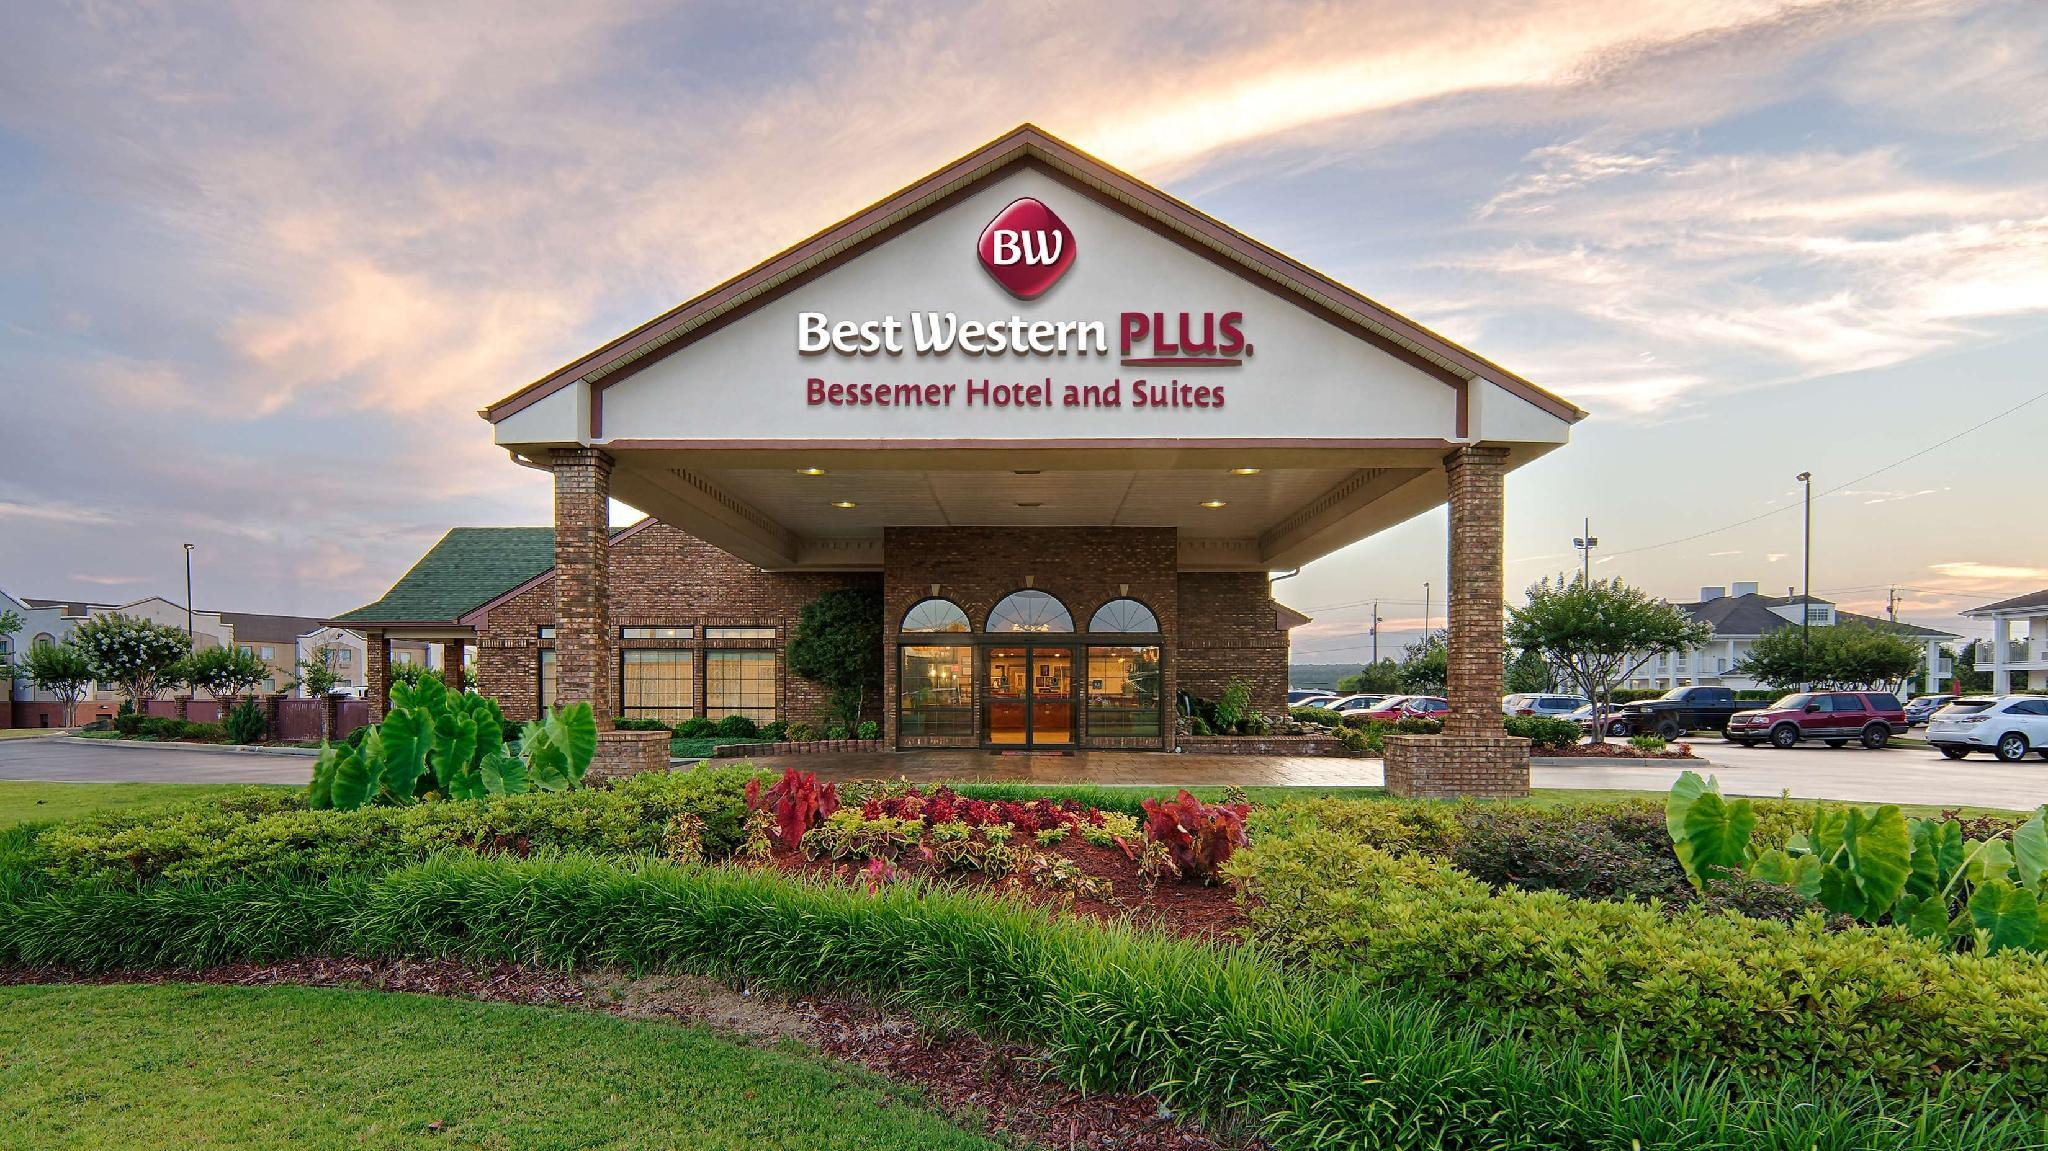 Best Western Plus Bessemer Hotel And Suites